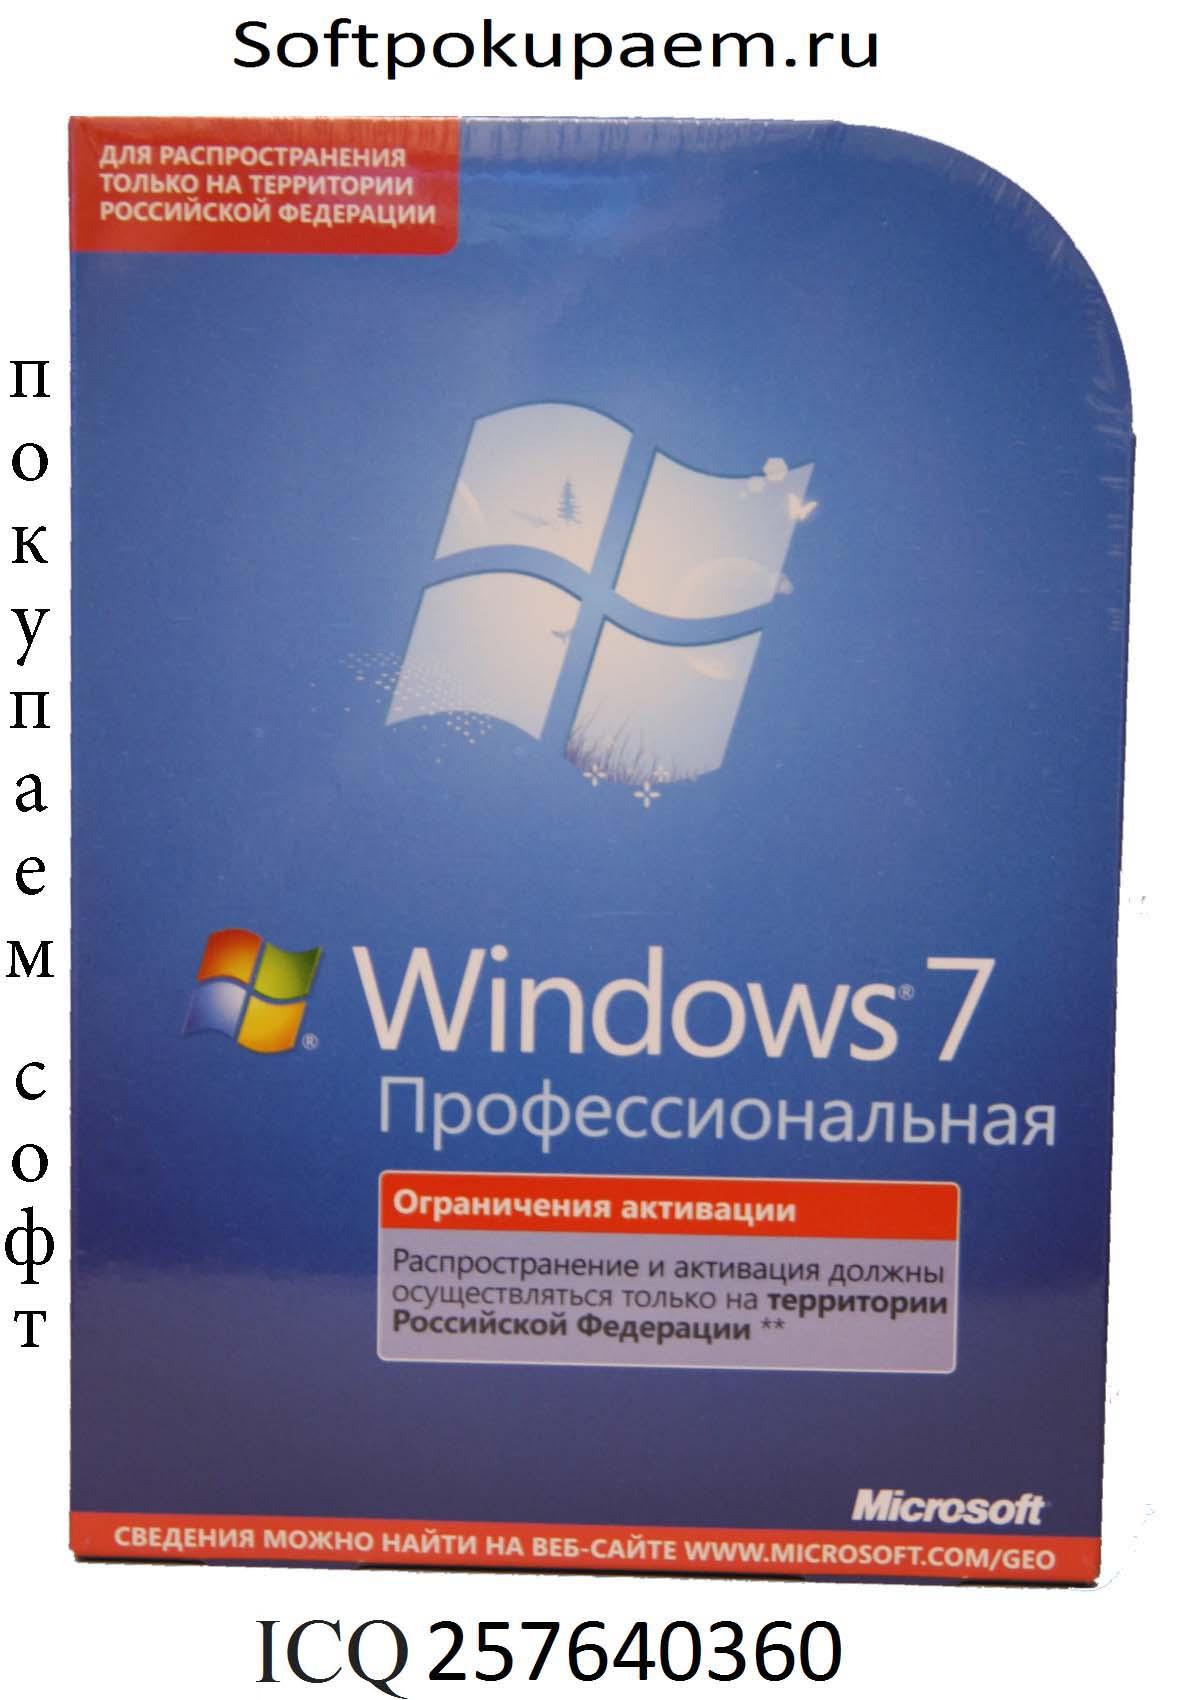 Microsoft (Майкрософт) купим оперативно и дорого лицензионное программное обеспе